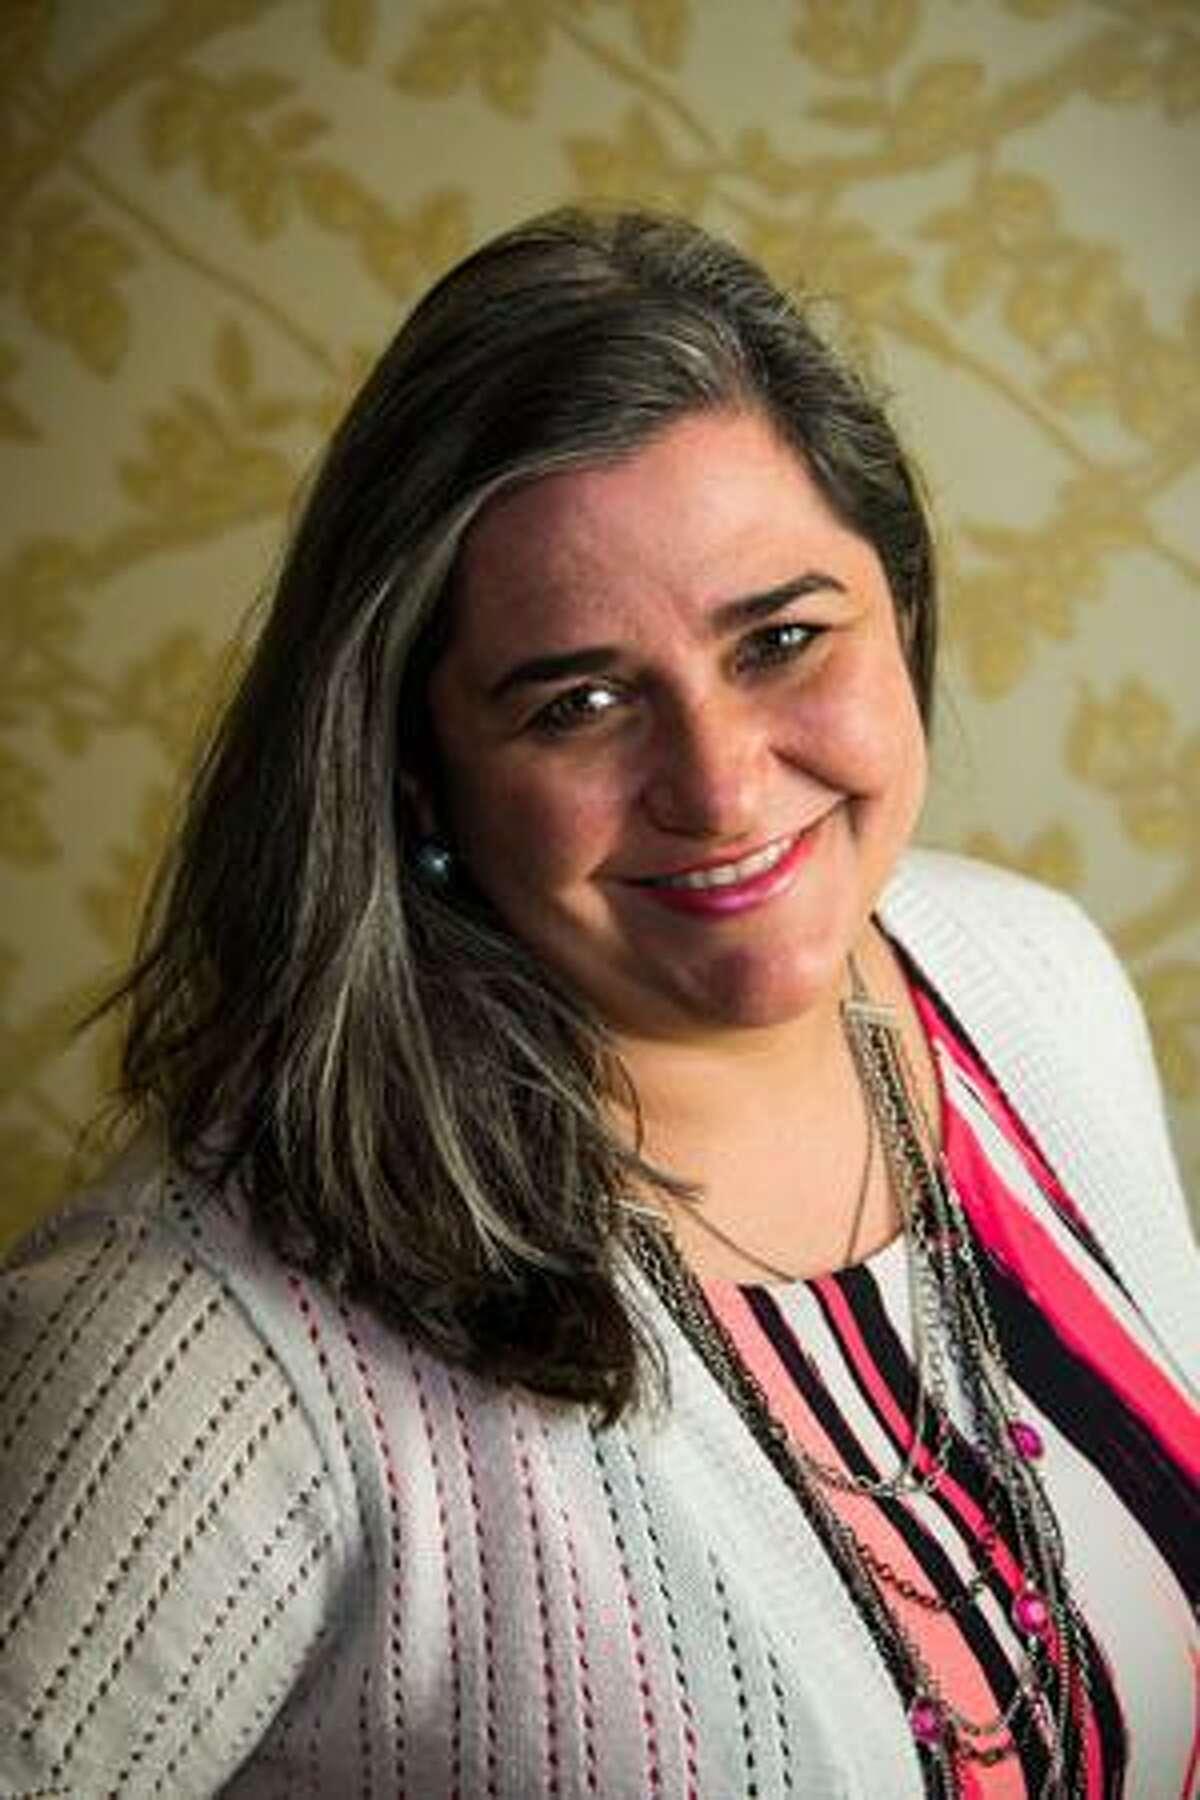 Spring ISD Community Engagement Coordinator and 2021-22 TEPSA President Dr. Lorena Zertuche.